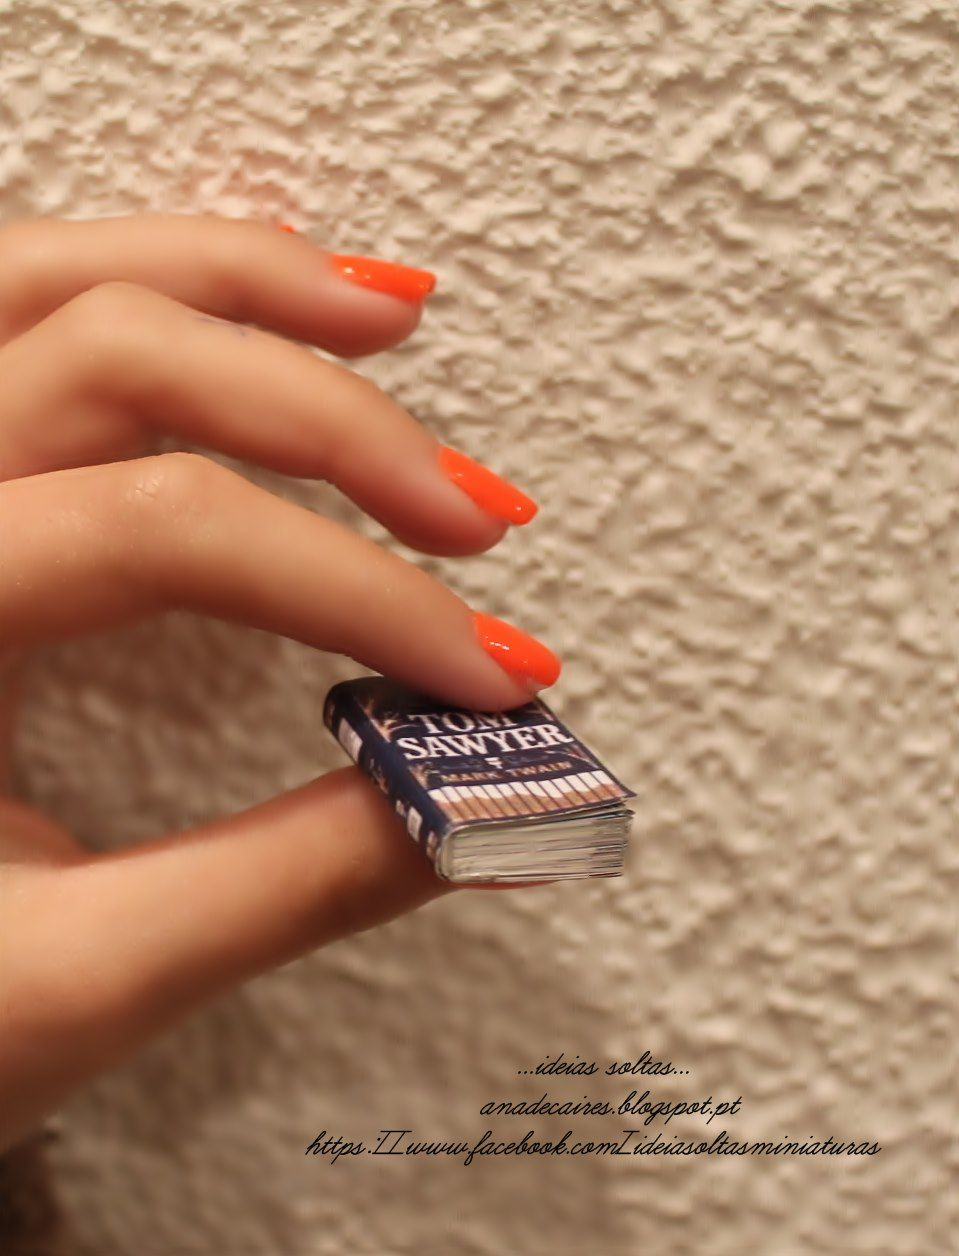 Mini Livros <3 https://www.facebook.com/ideiasoltasminiaturas http://anadecaires.blogspot.pt/